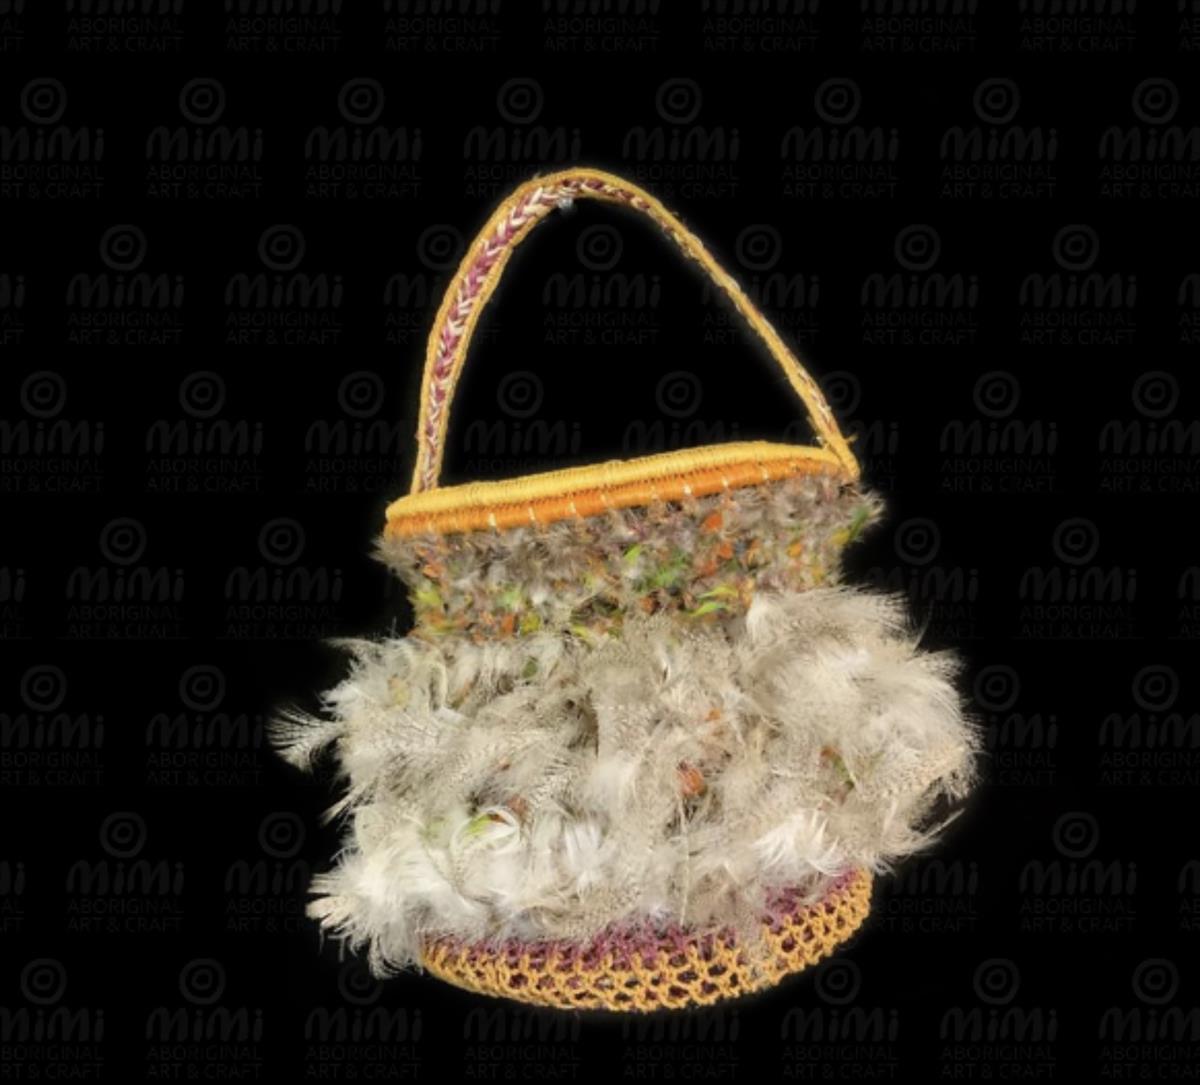 Netted pandanus basket with feathers by Dorothy Dullman Bienanwangu